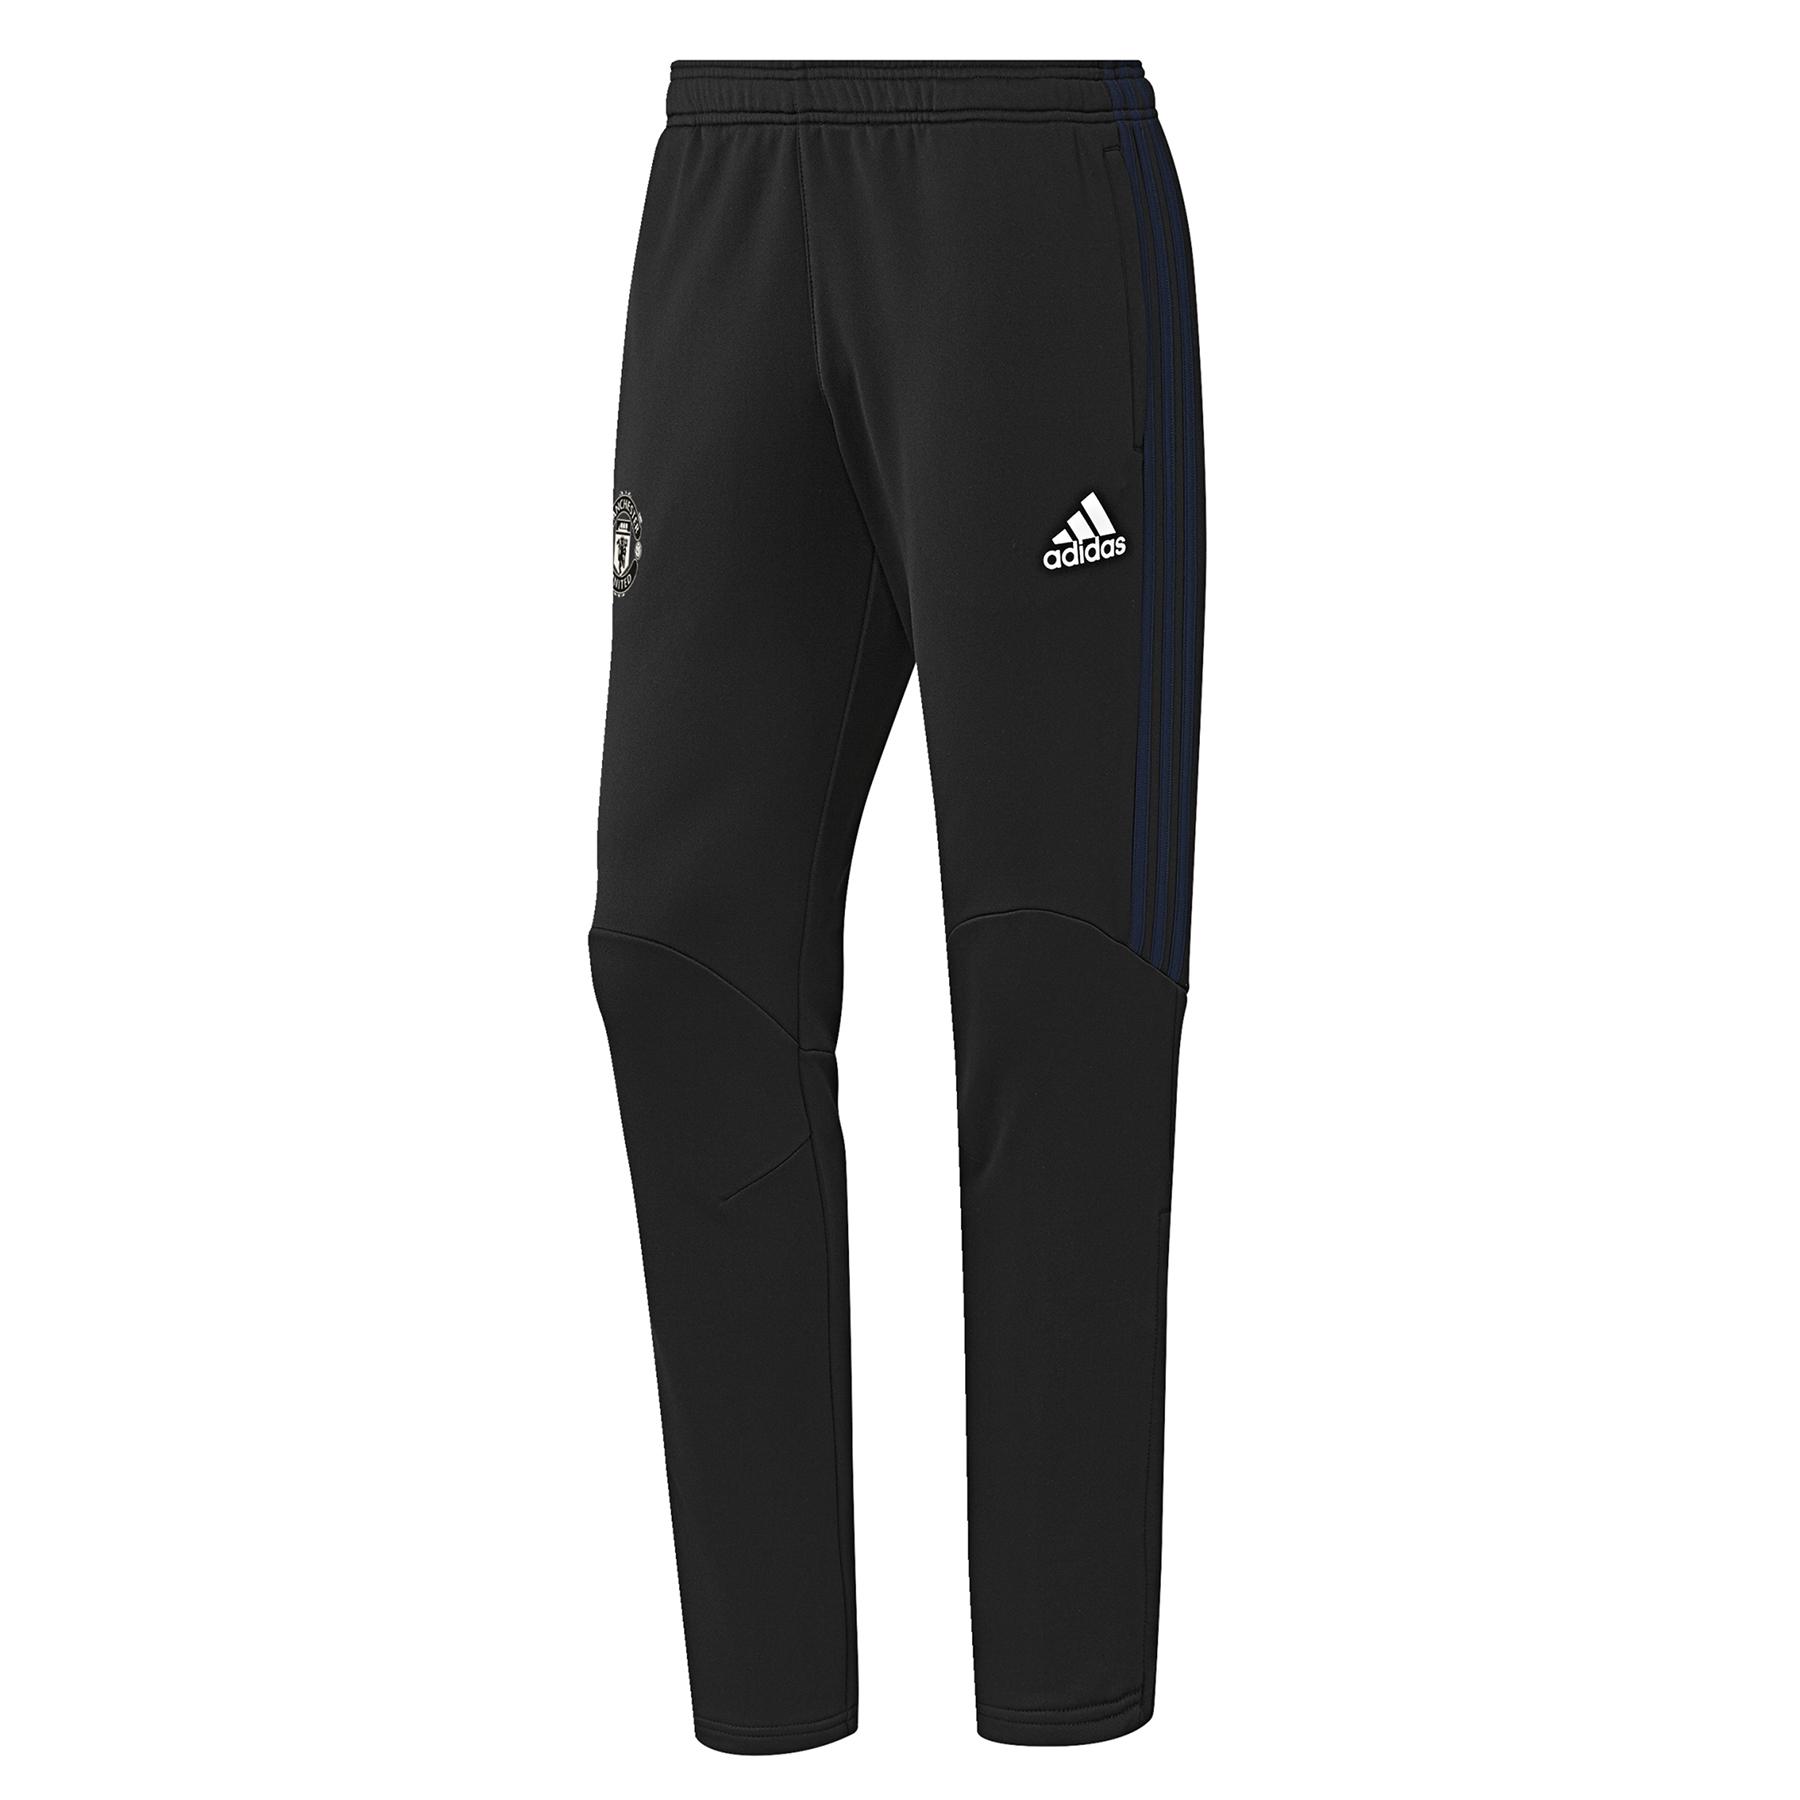 Manchester United Training Presentation Pants - Black